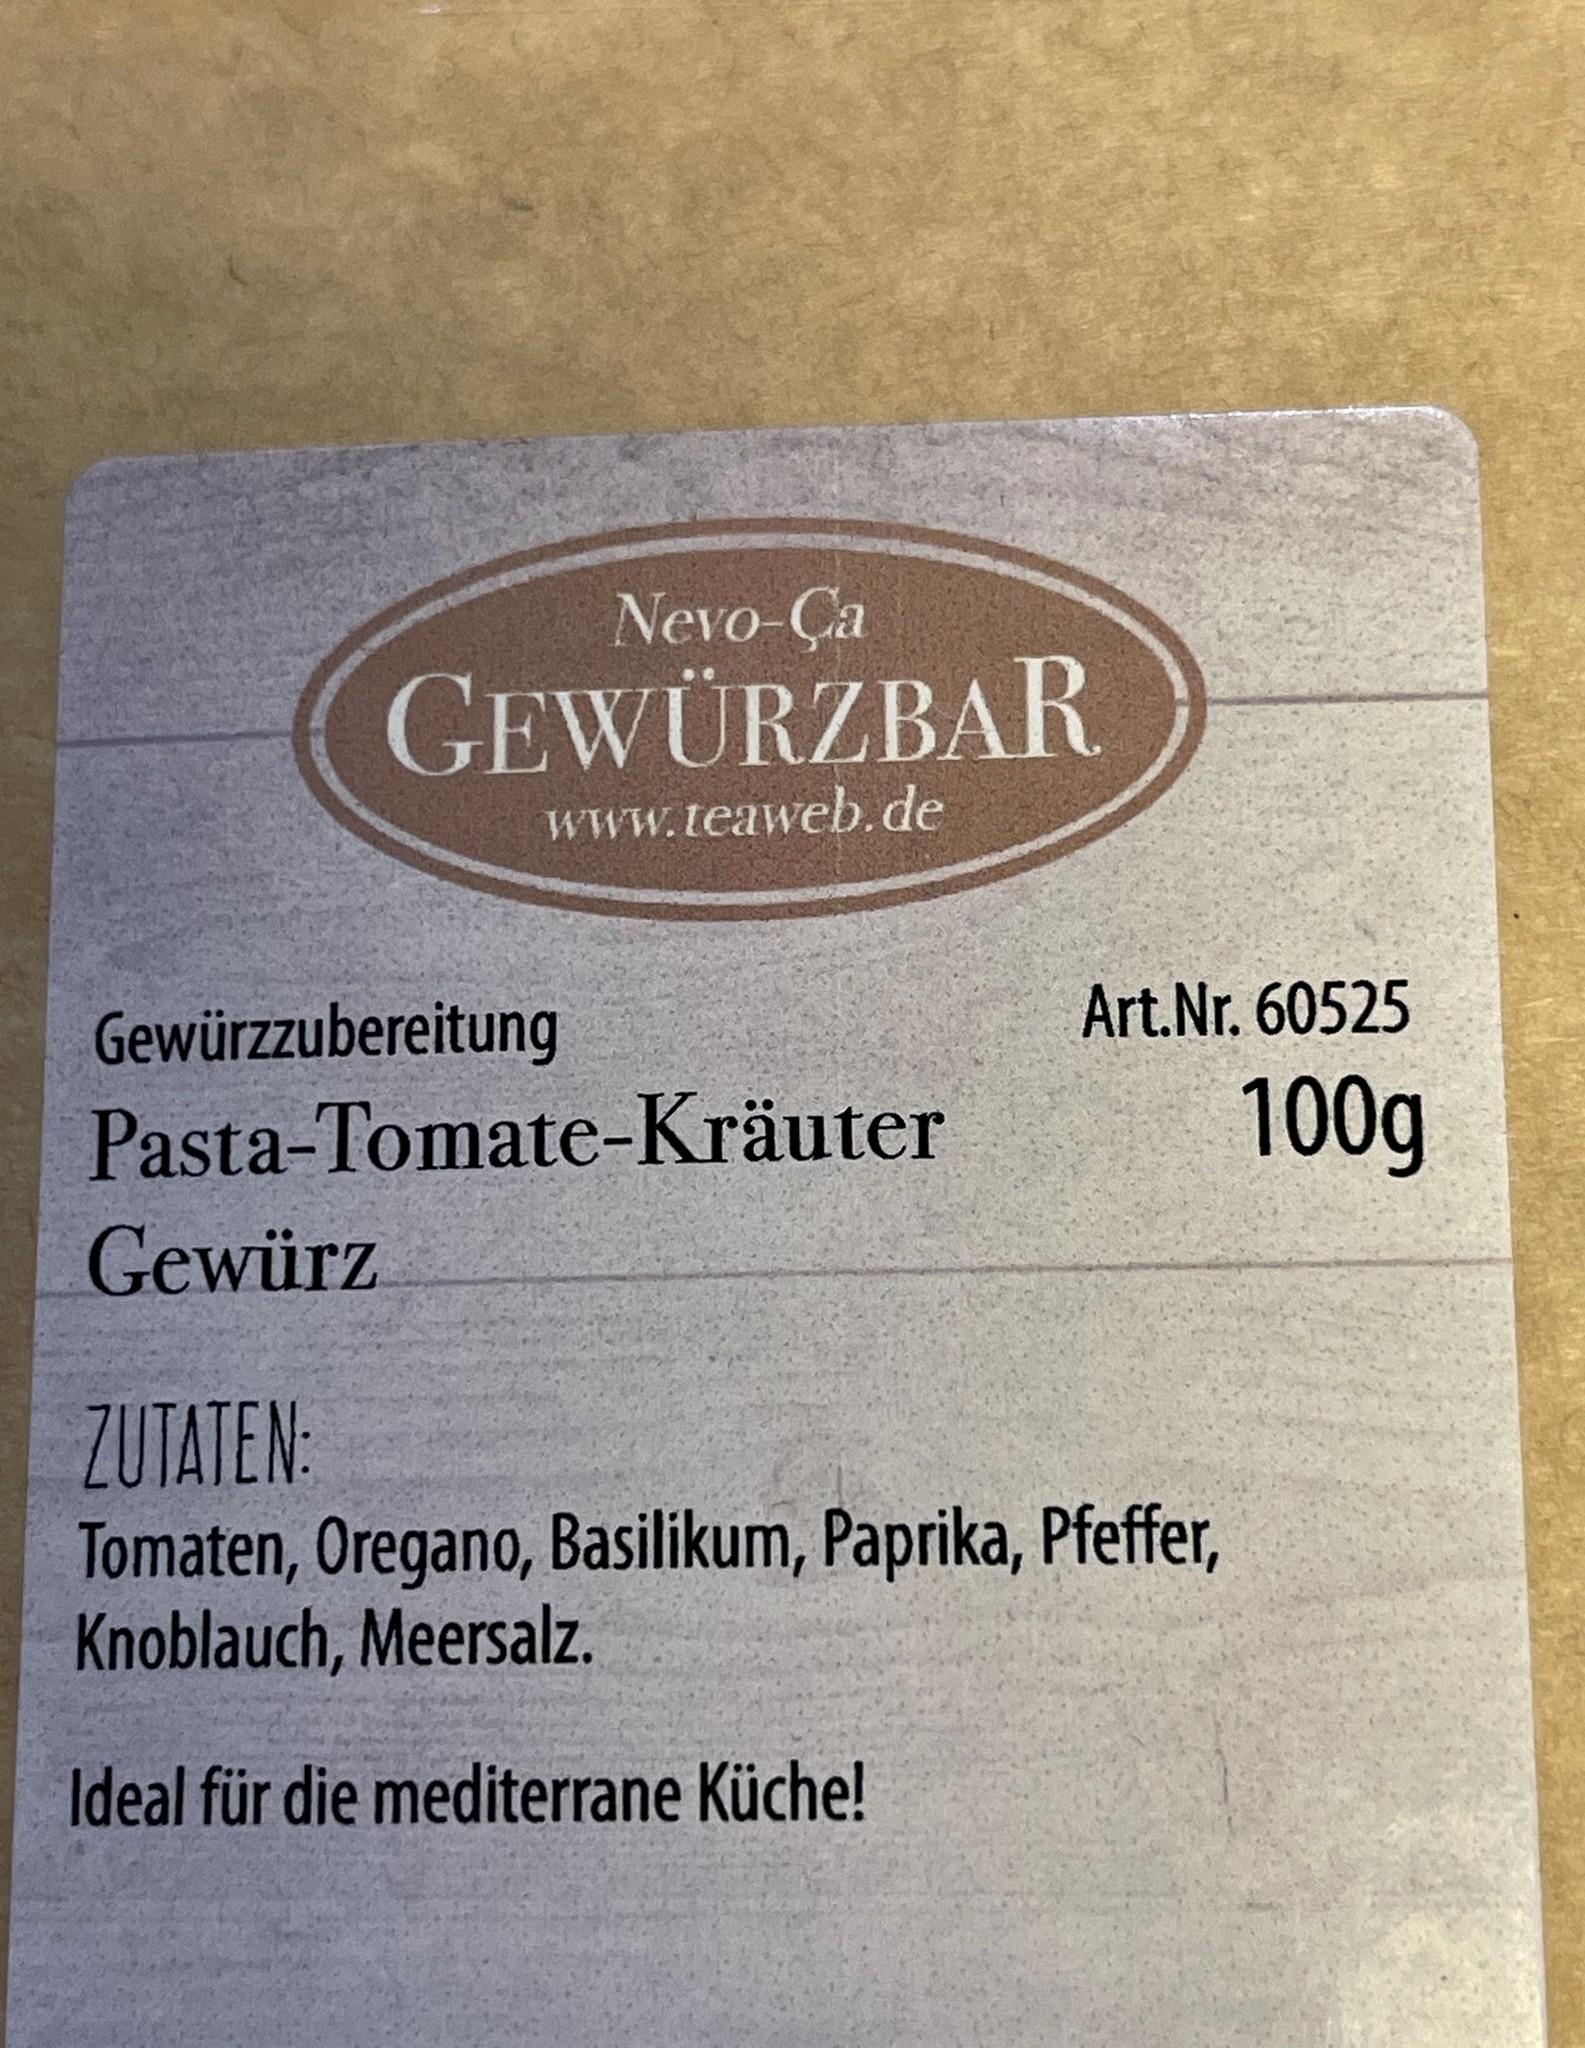 Pasta-Tomate-Kräuter Gewürz